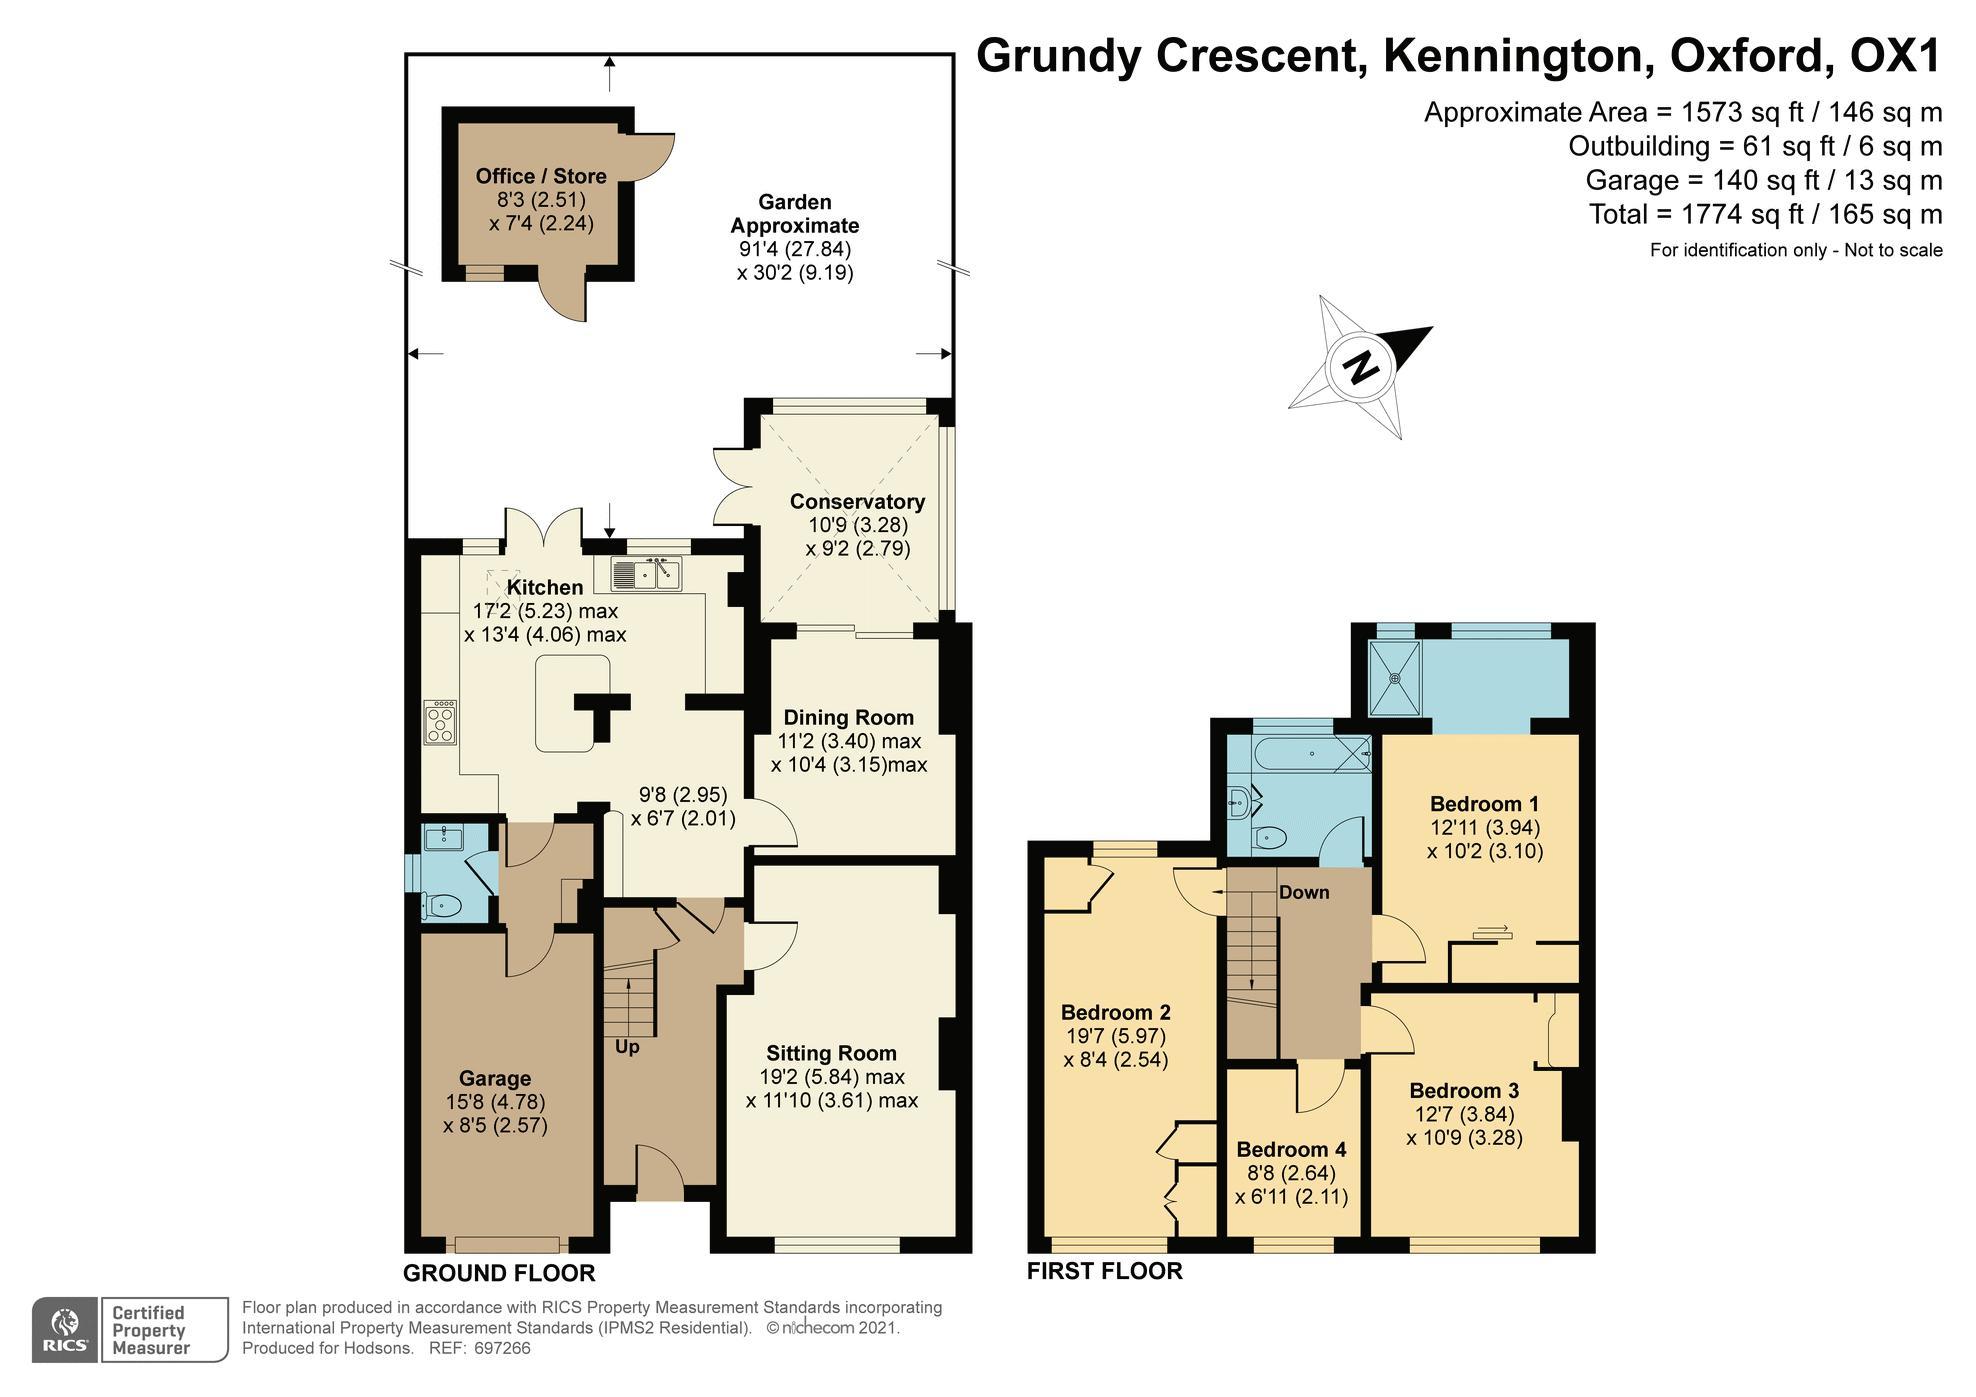 Grundy Crescent Kennington